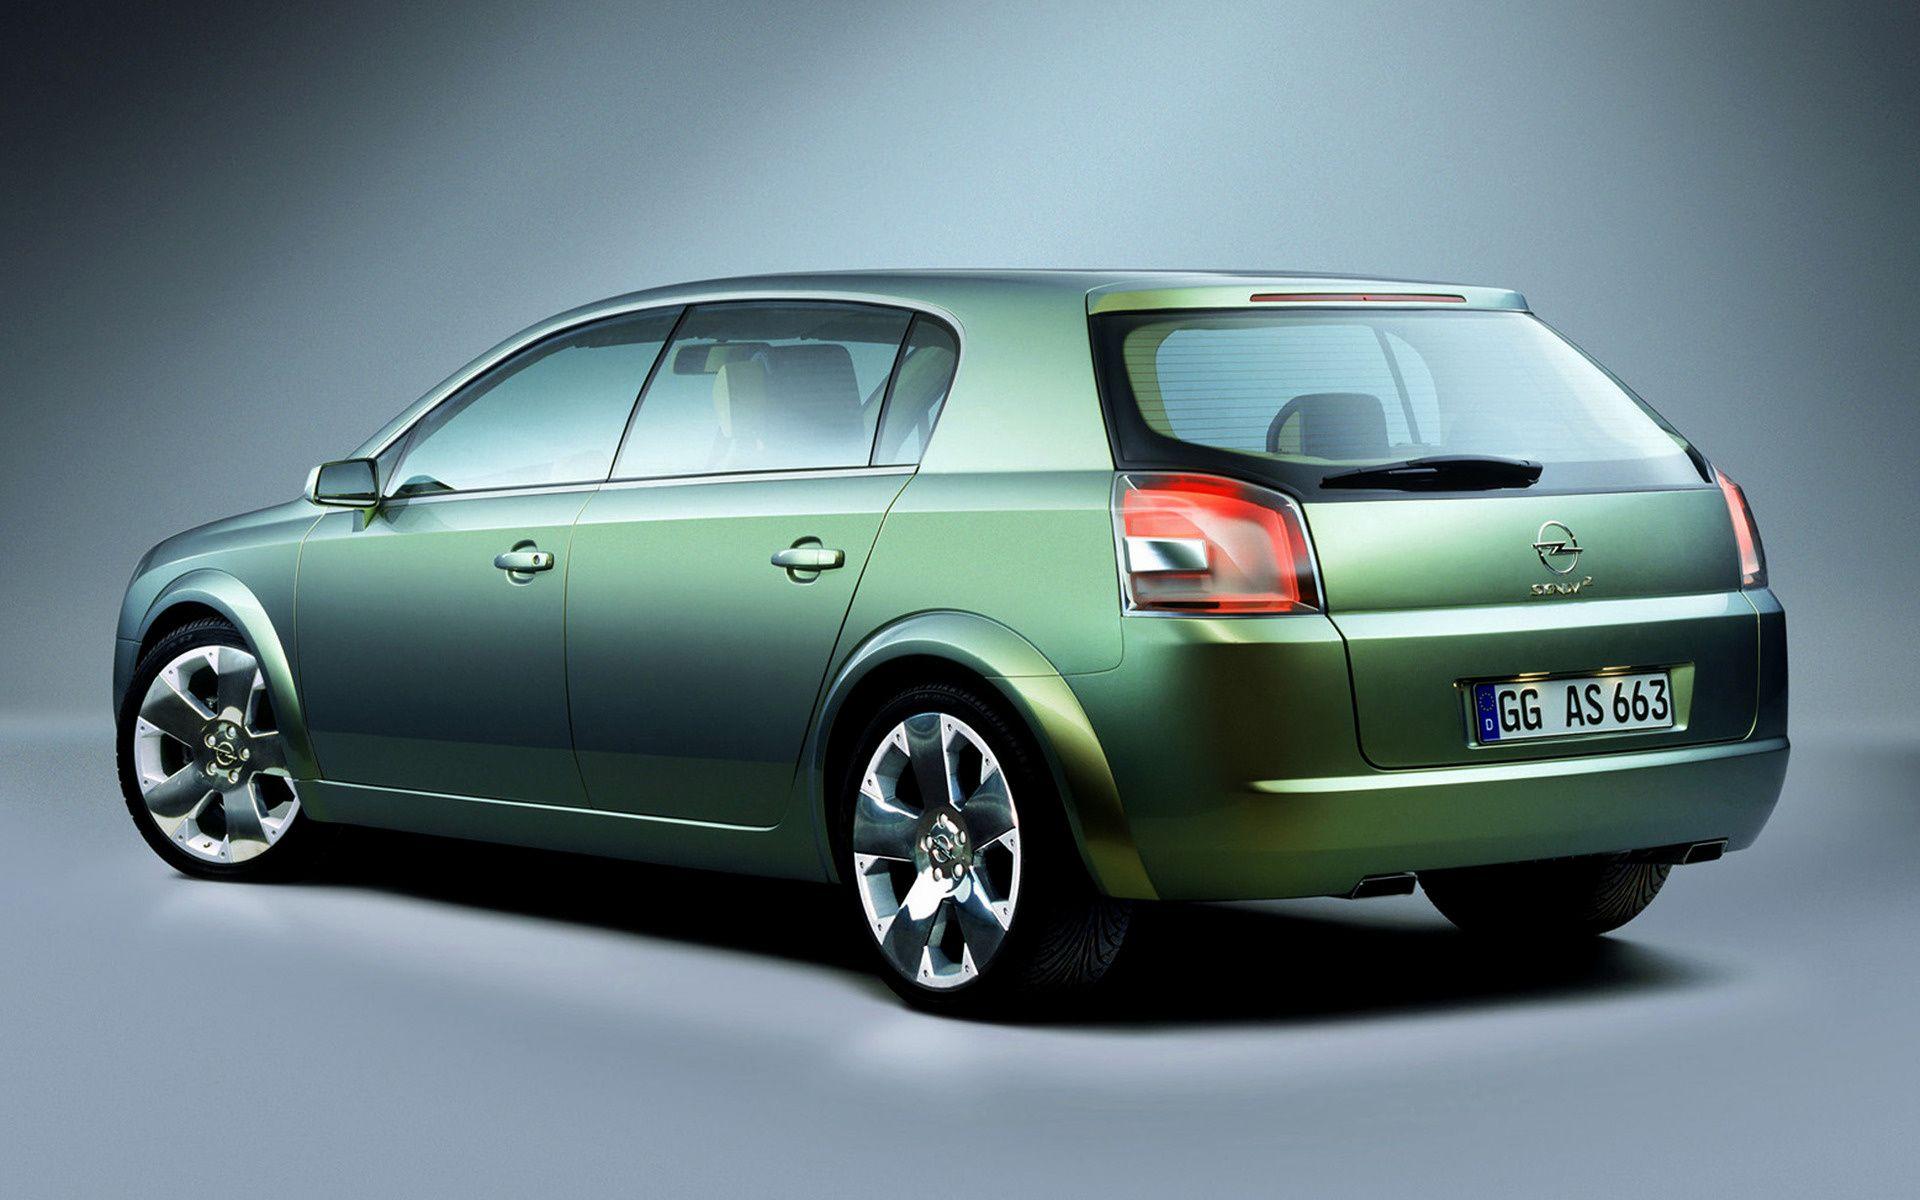 2001 Opel Signum Ii Concept